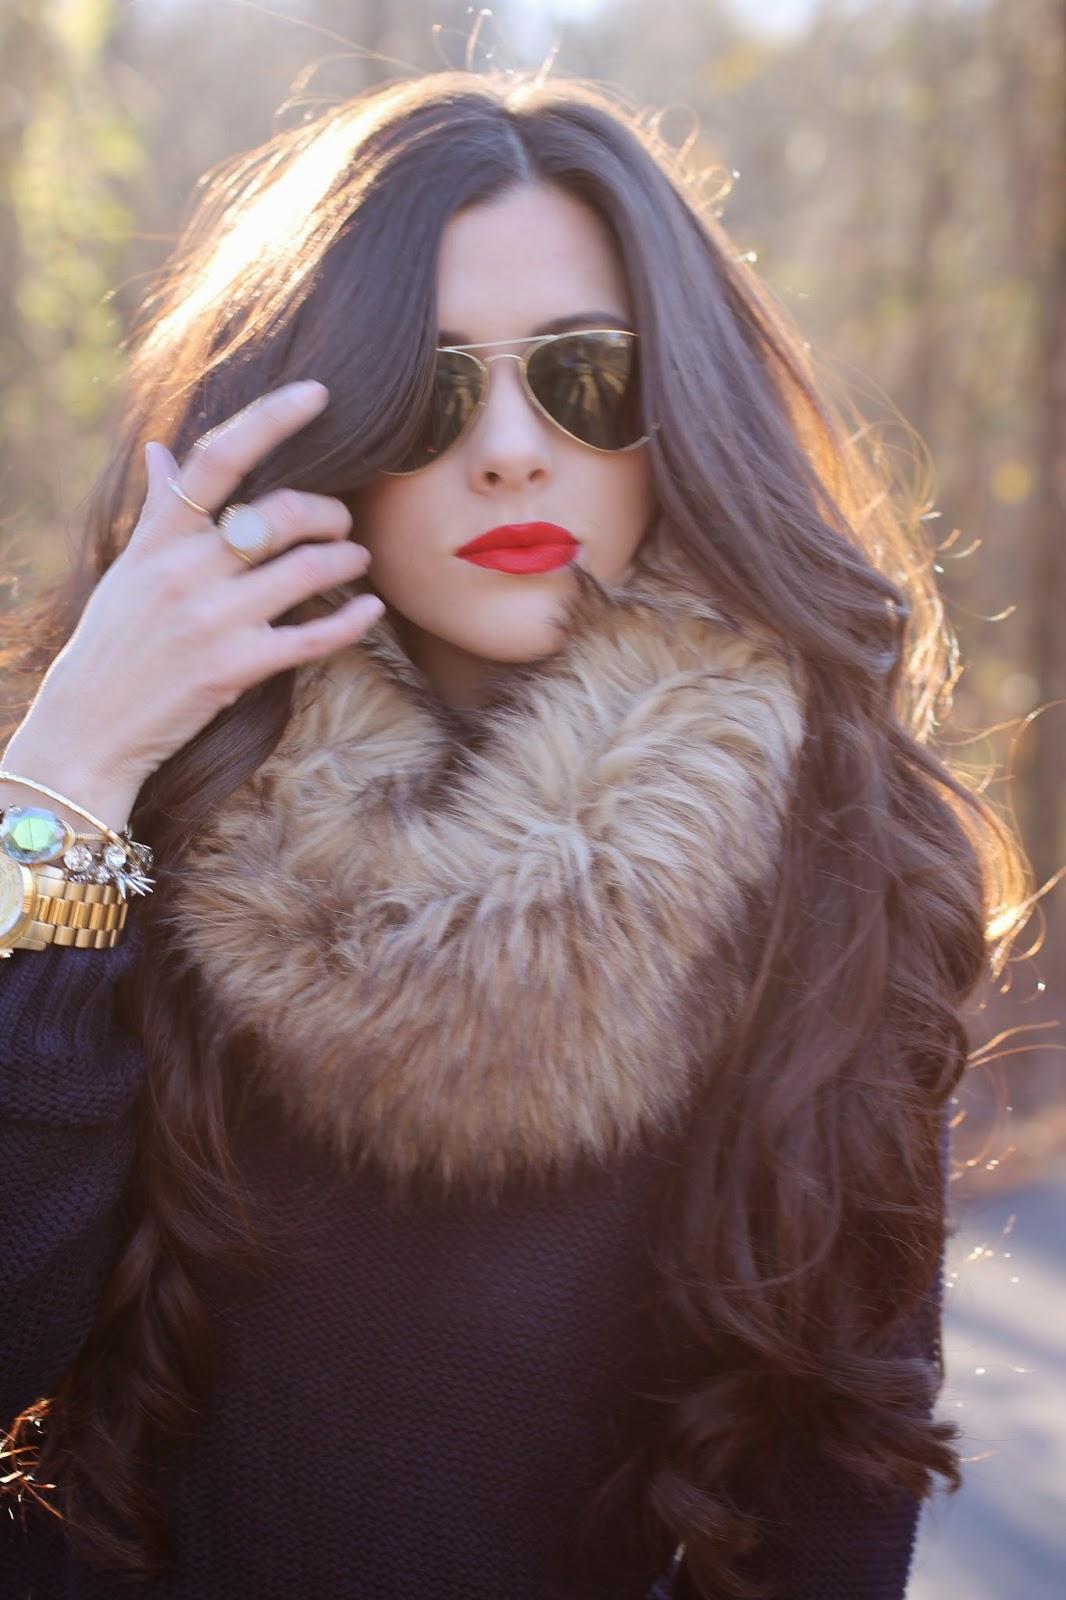 hair extensions, bellami hair, michael kors watch gold, fur snood, gold michael kors watch, tory burch, tory burch boots, tory burch purse, kiernan riding boot, rayban aviators, fashion blog, style blog, winter 2014 trends, stila cosmetics, stila fiery, stila beso